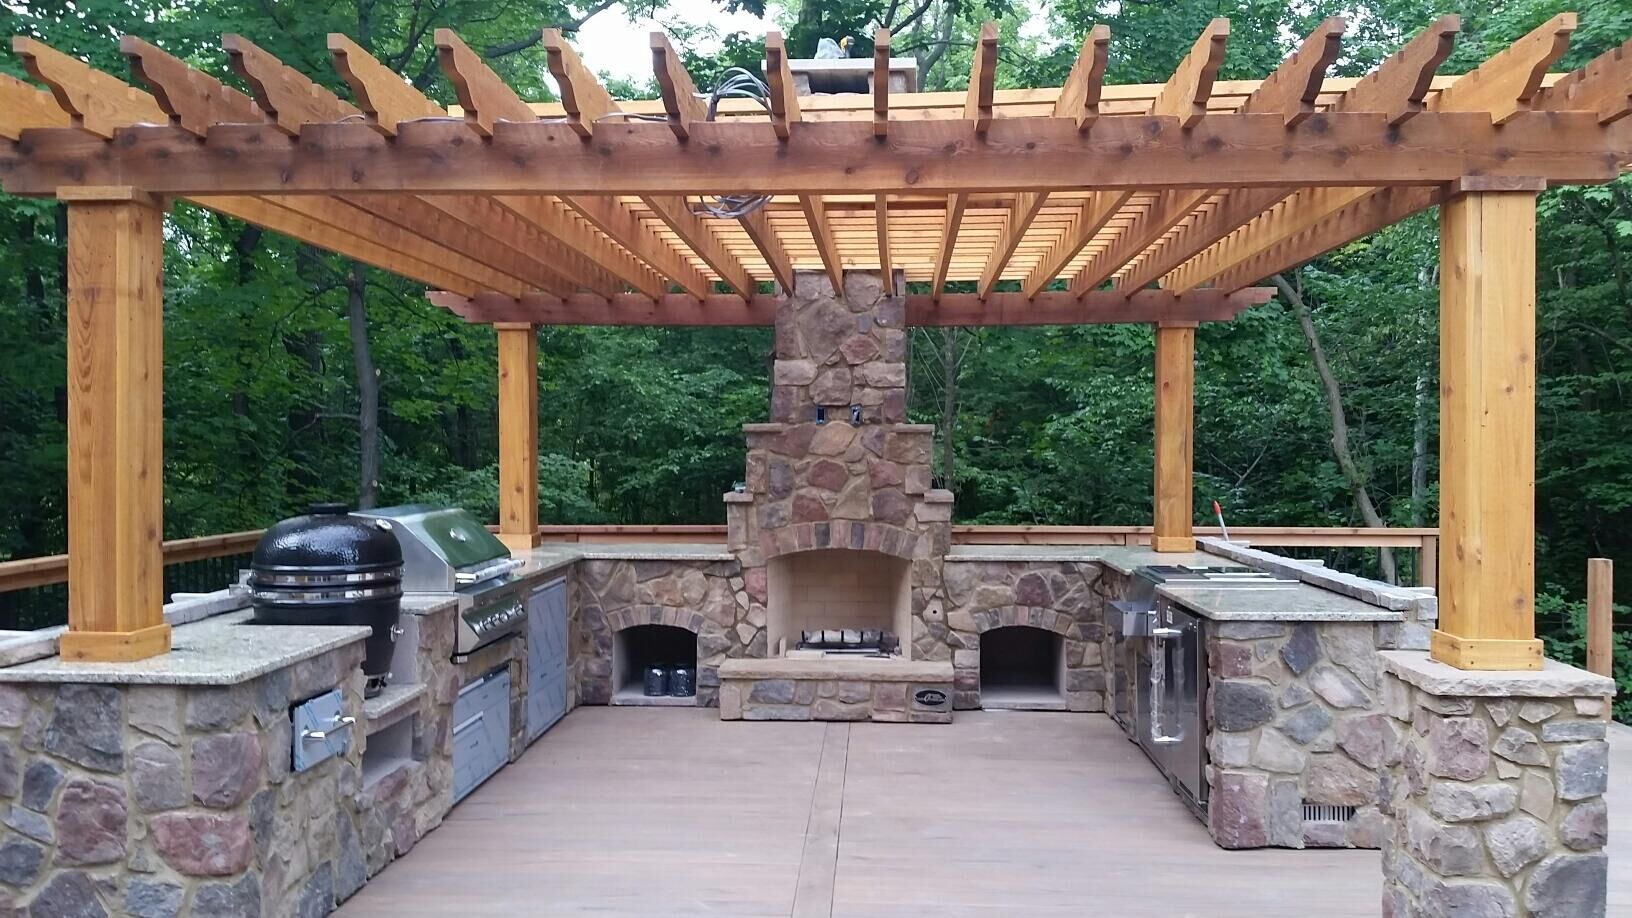 Pergola outdoor kitchen backyard outdoor room deck patio landscape design countertop